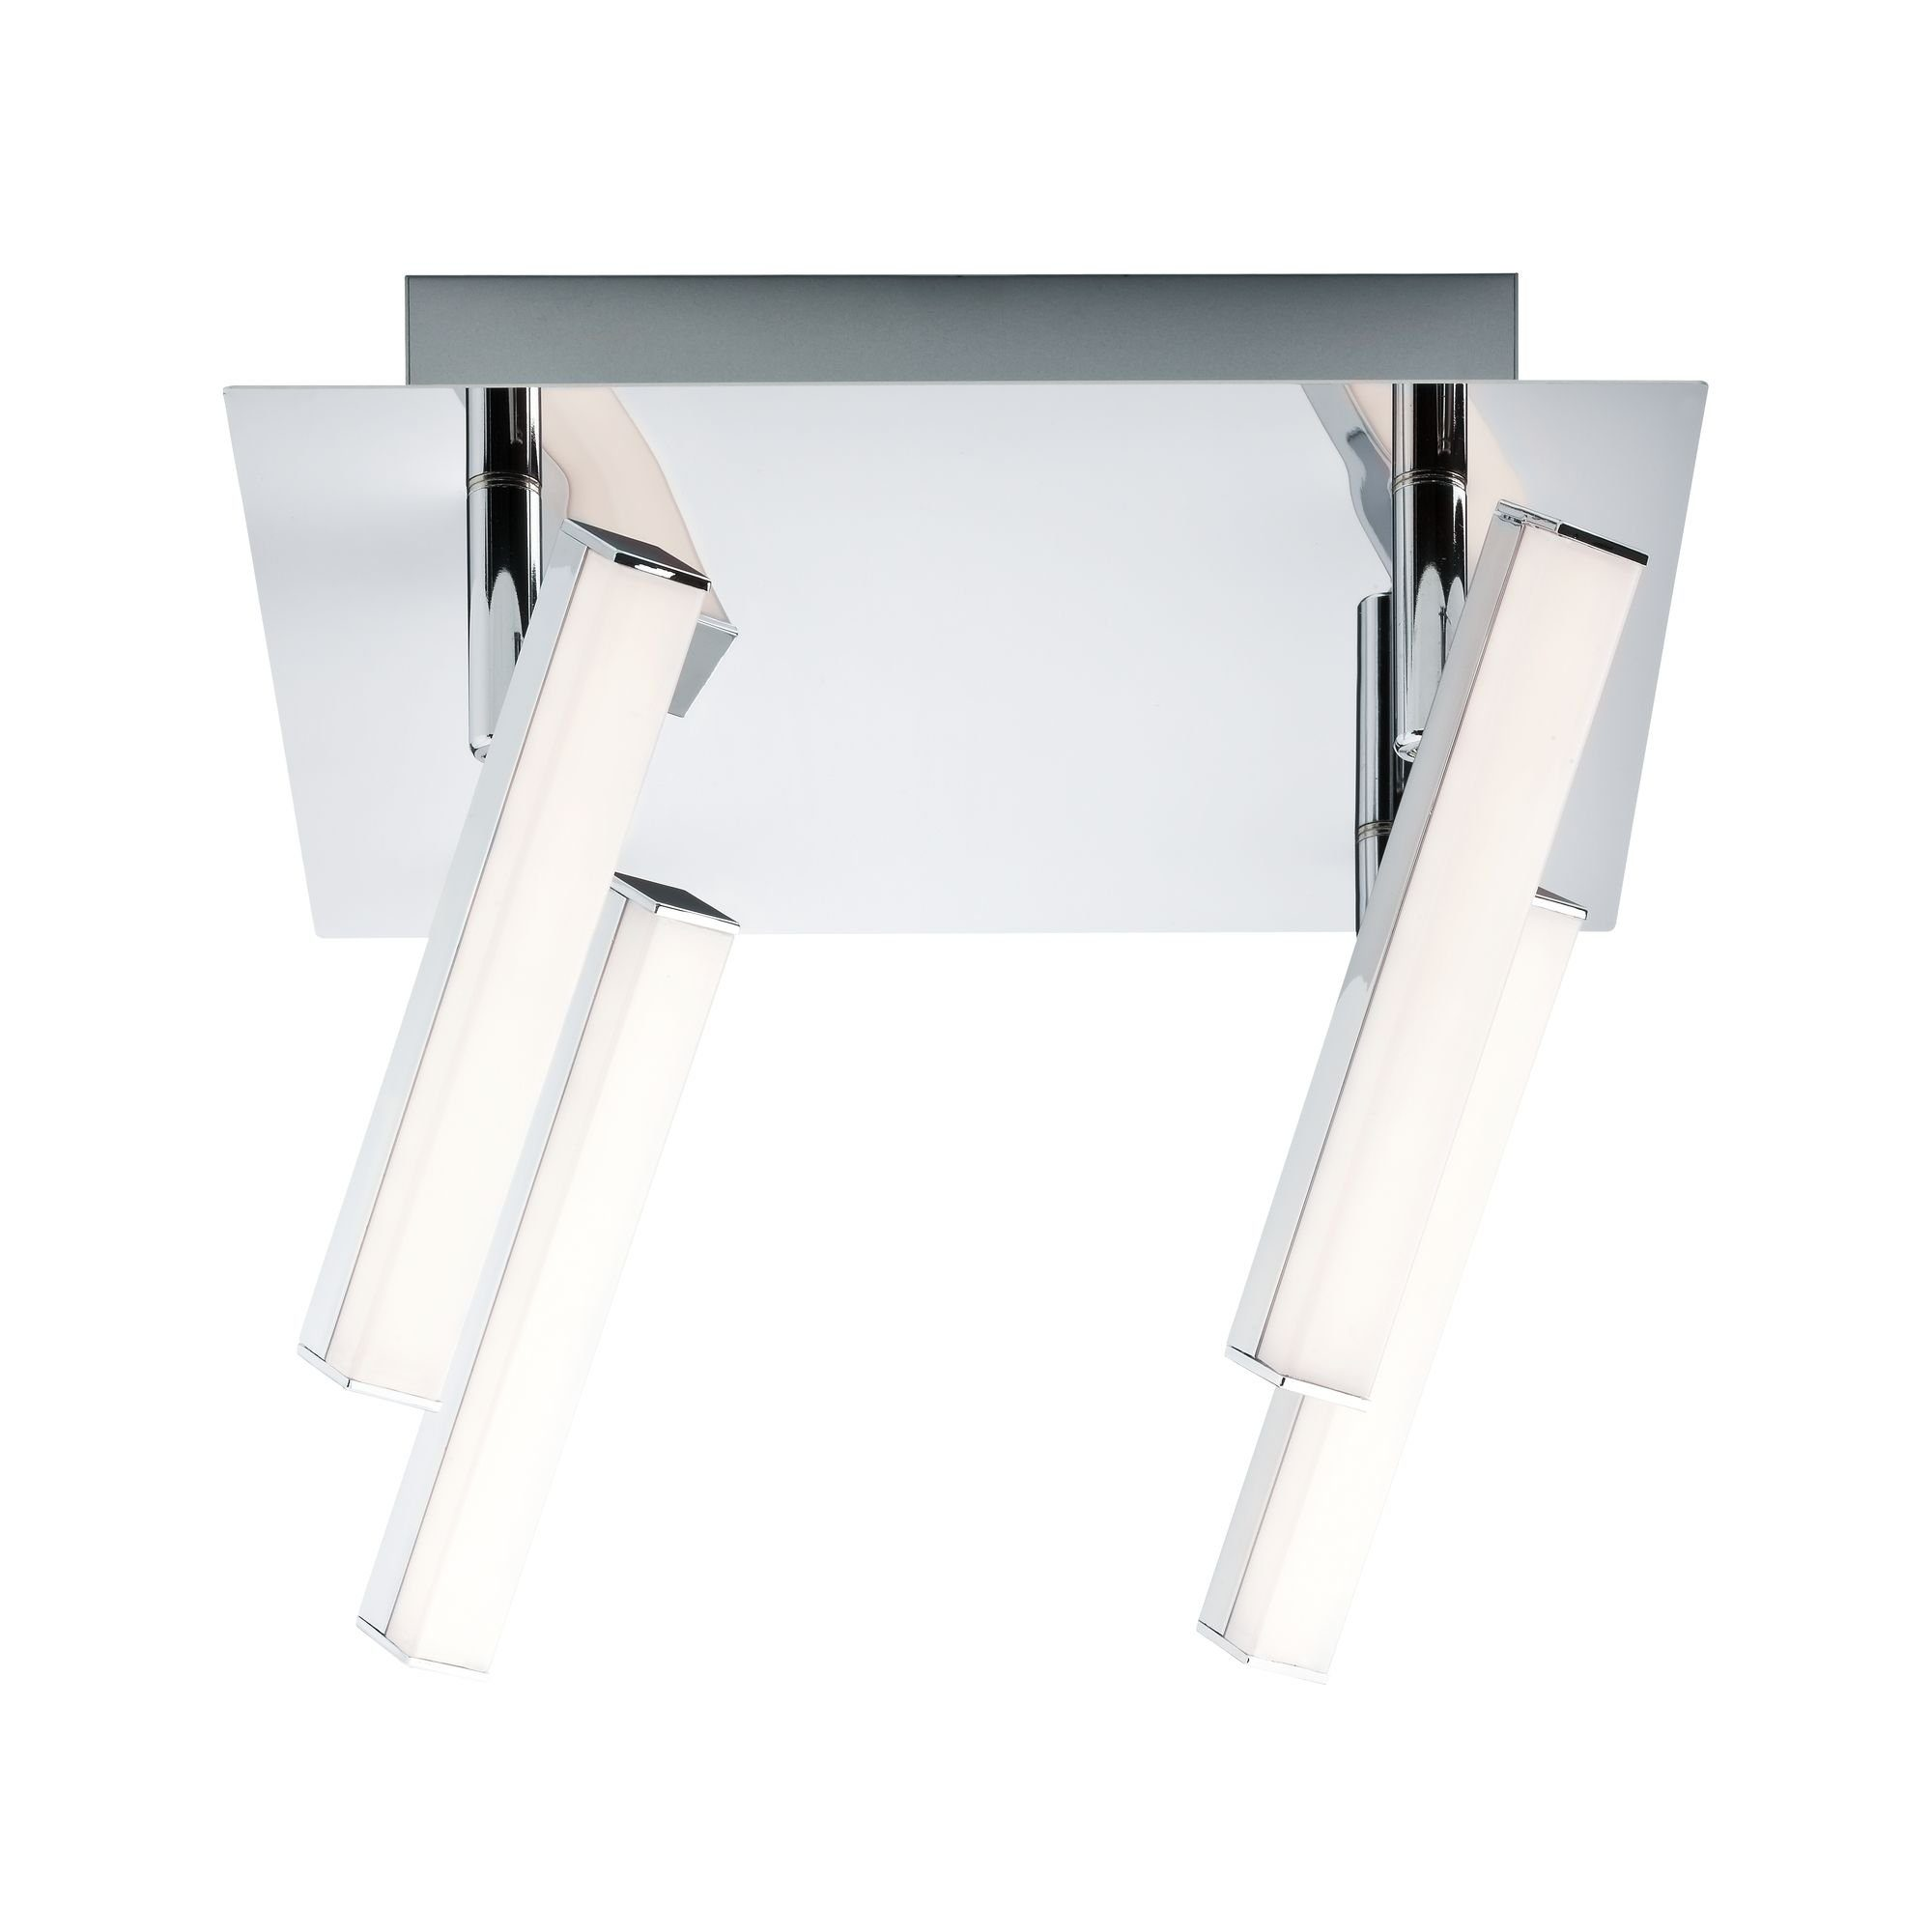 Paulmann LED Deckenleuchte 4er-Spot Chrom Silberfarben Pole 4x4,2W, 1 St., Warmweiß